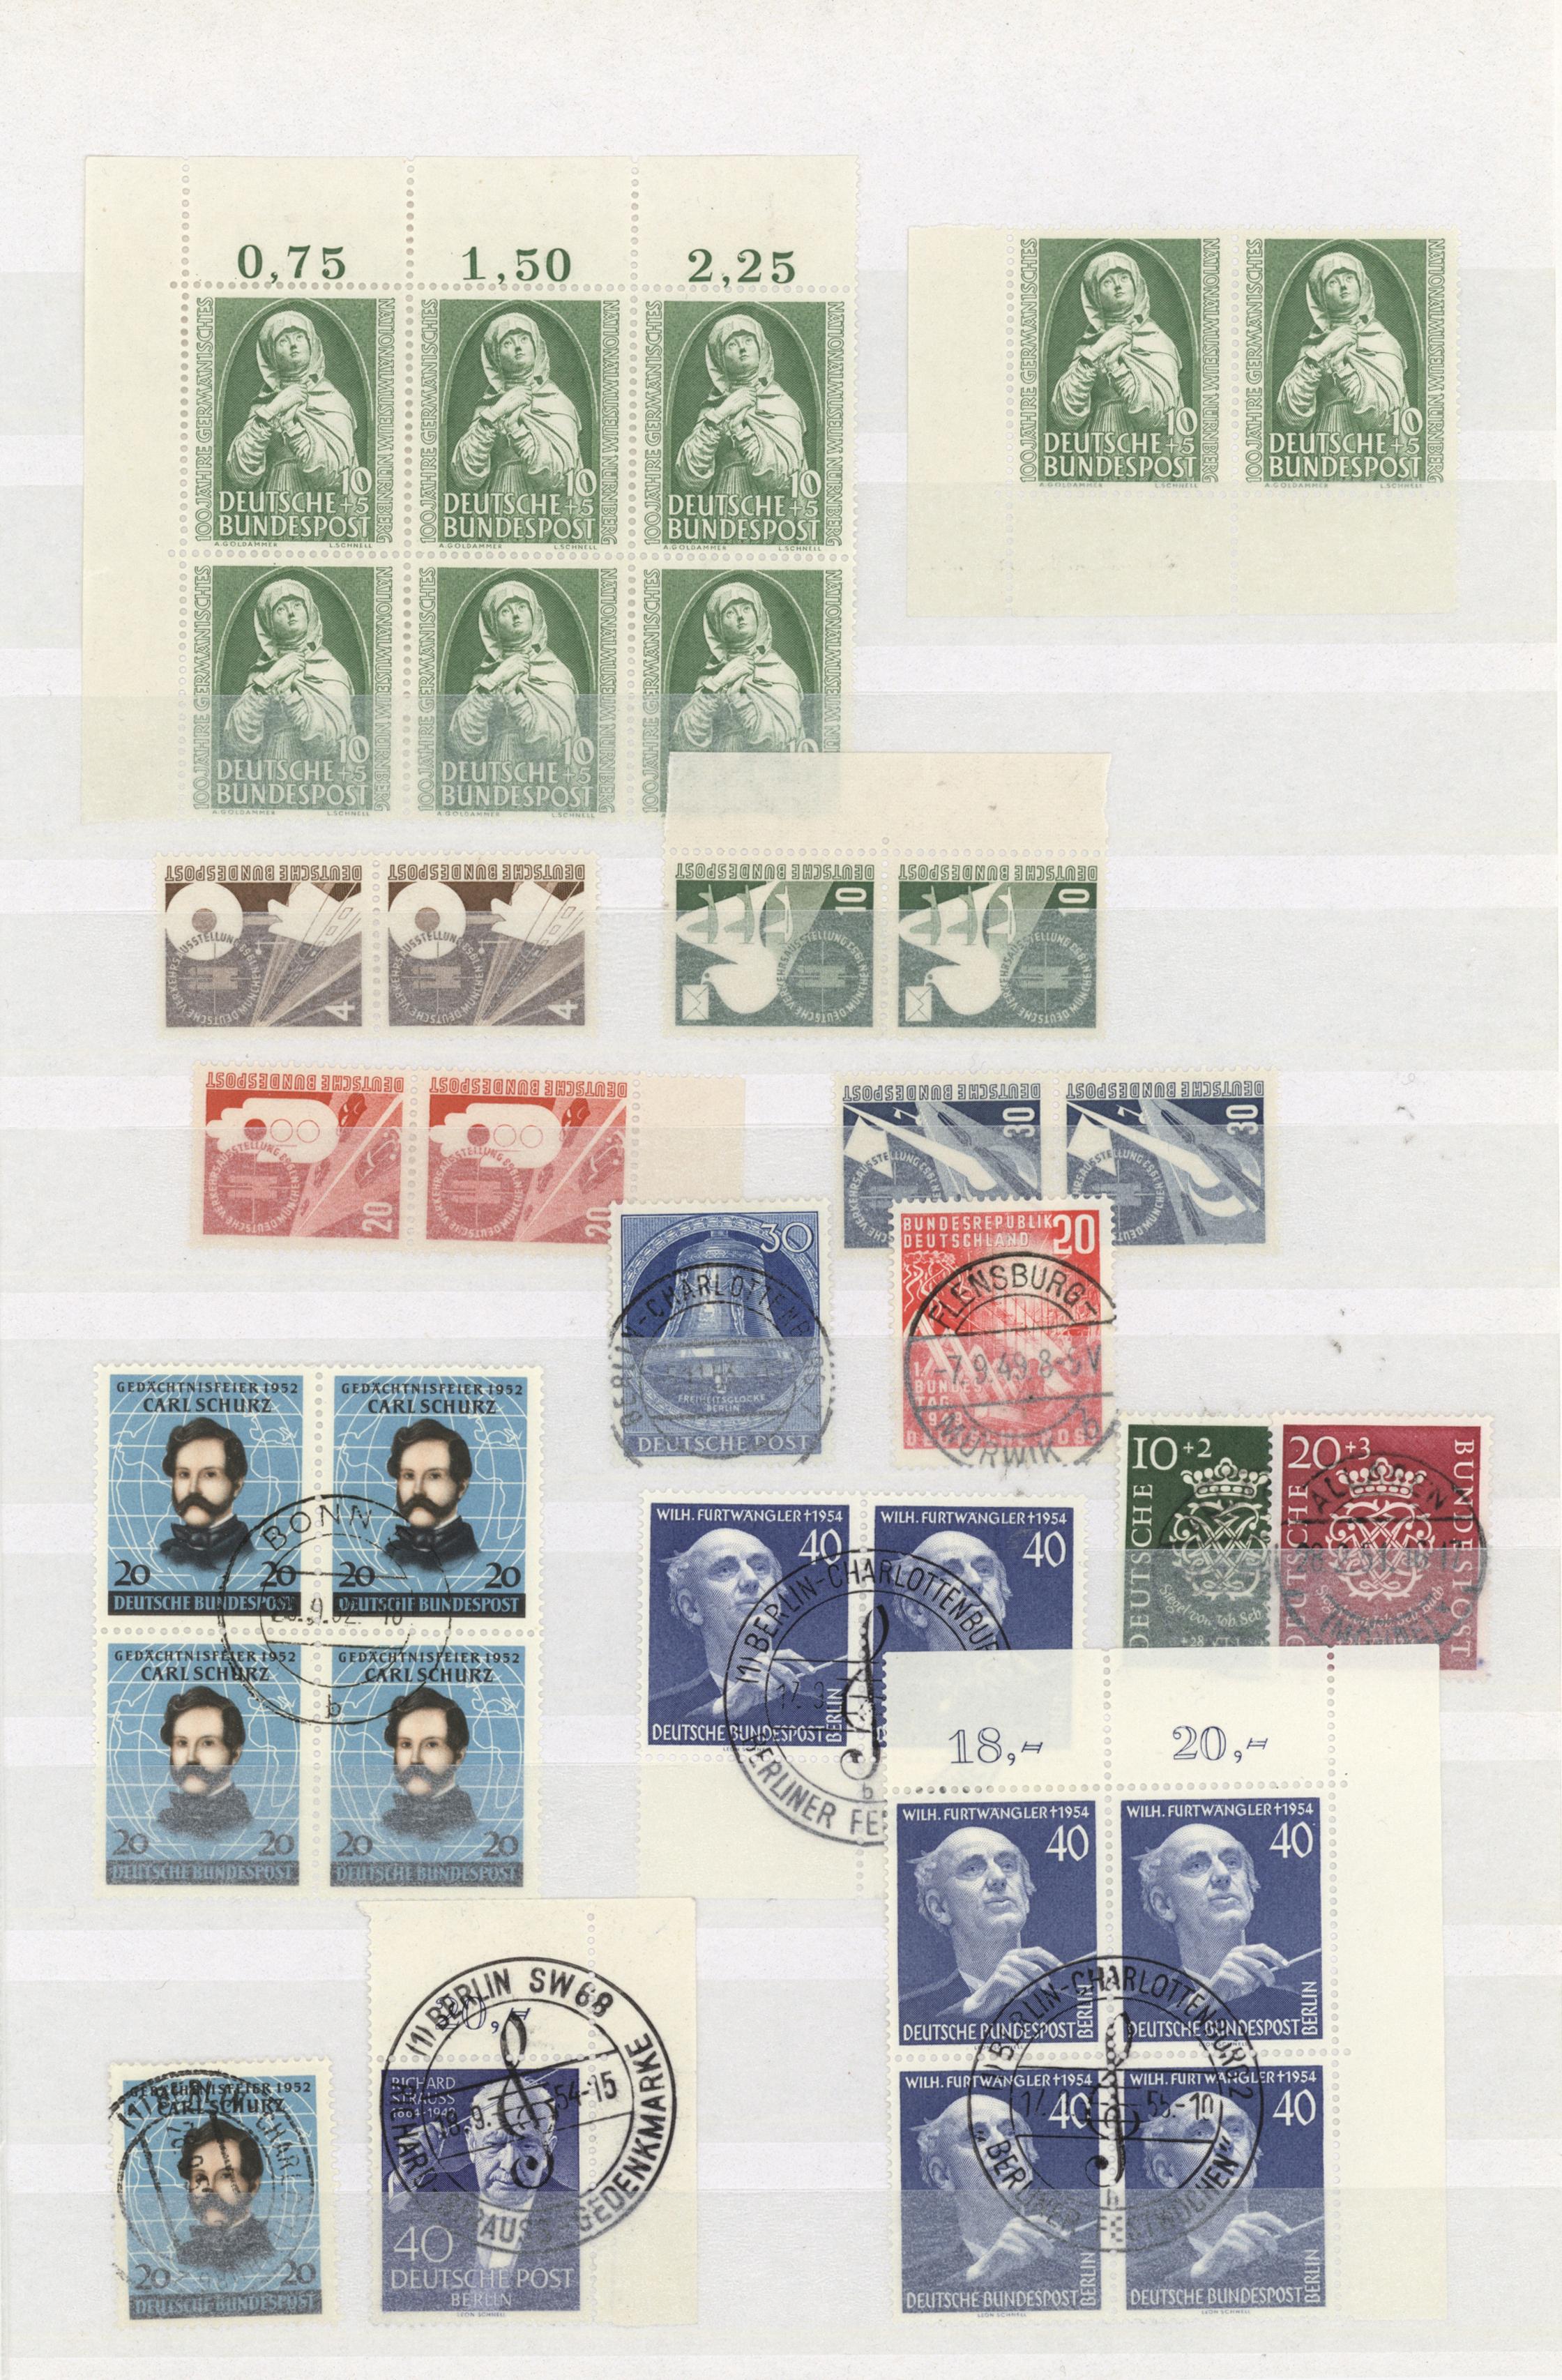 Lot 38083 - bundesrepublik und berlin  -  Auktionshaus Christoph Gärtner GmbH & Co. KG Collections Germany,  Collections Supplement, Surprise boxes #39 Day 7